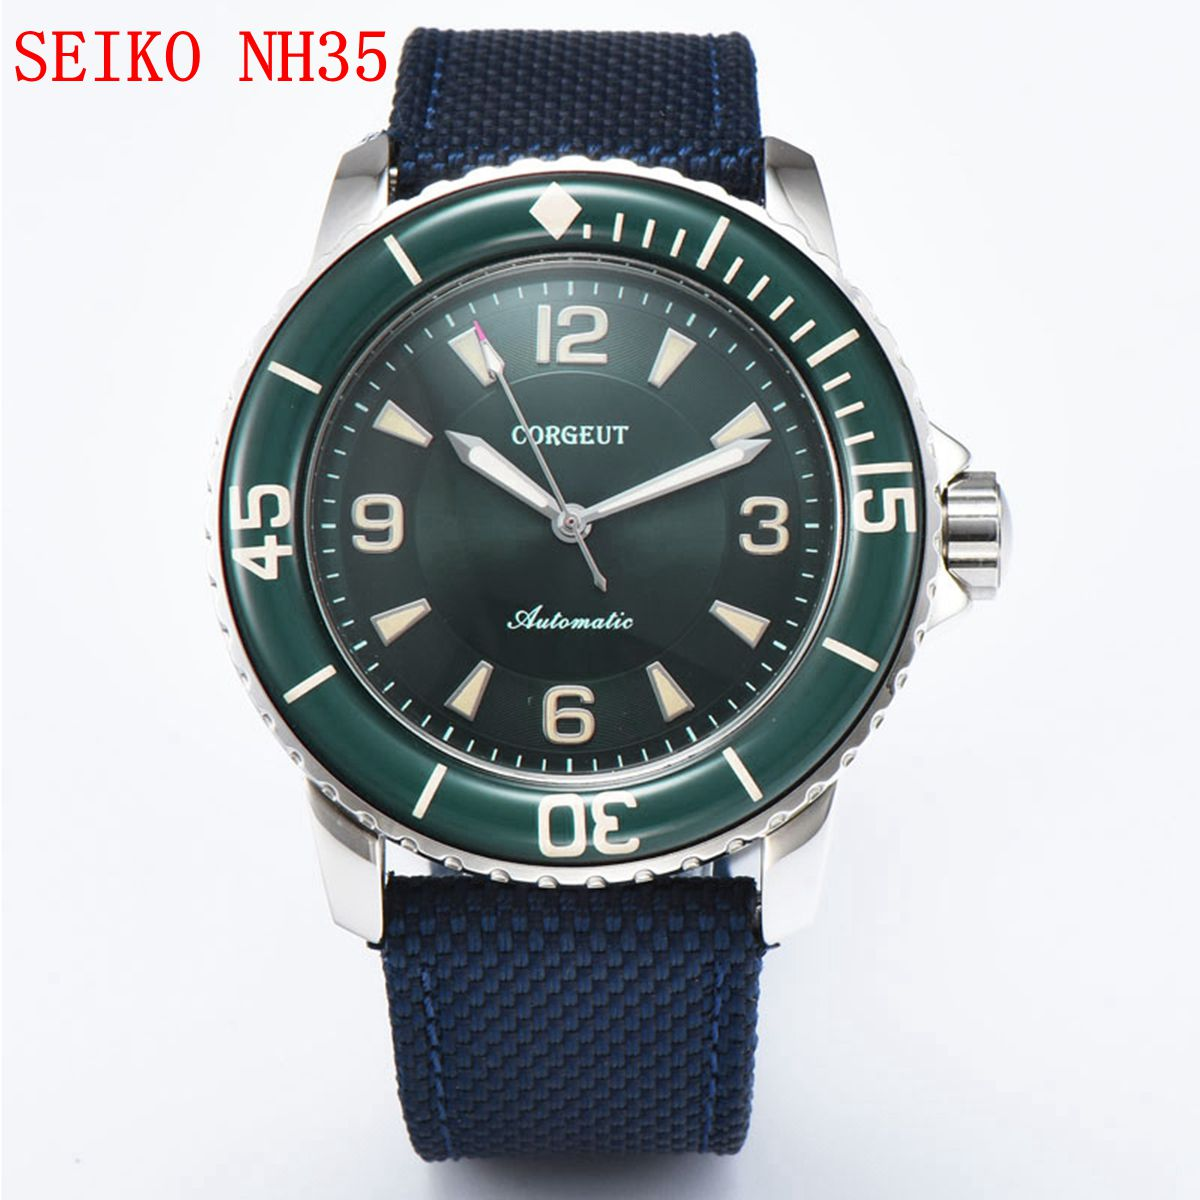 NH35 التلقائي ساعة رجالي 45 مللي متر الرياضة تصميم ساعة فاخرة ماركة Corgeut الميكانيكية مضيئة الذاتي الرياح خمر ساعة اليد الذكور